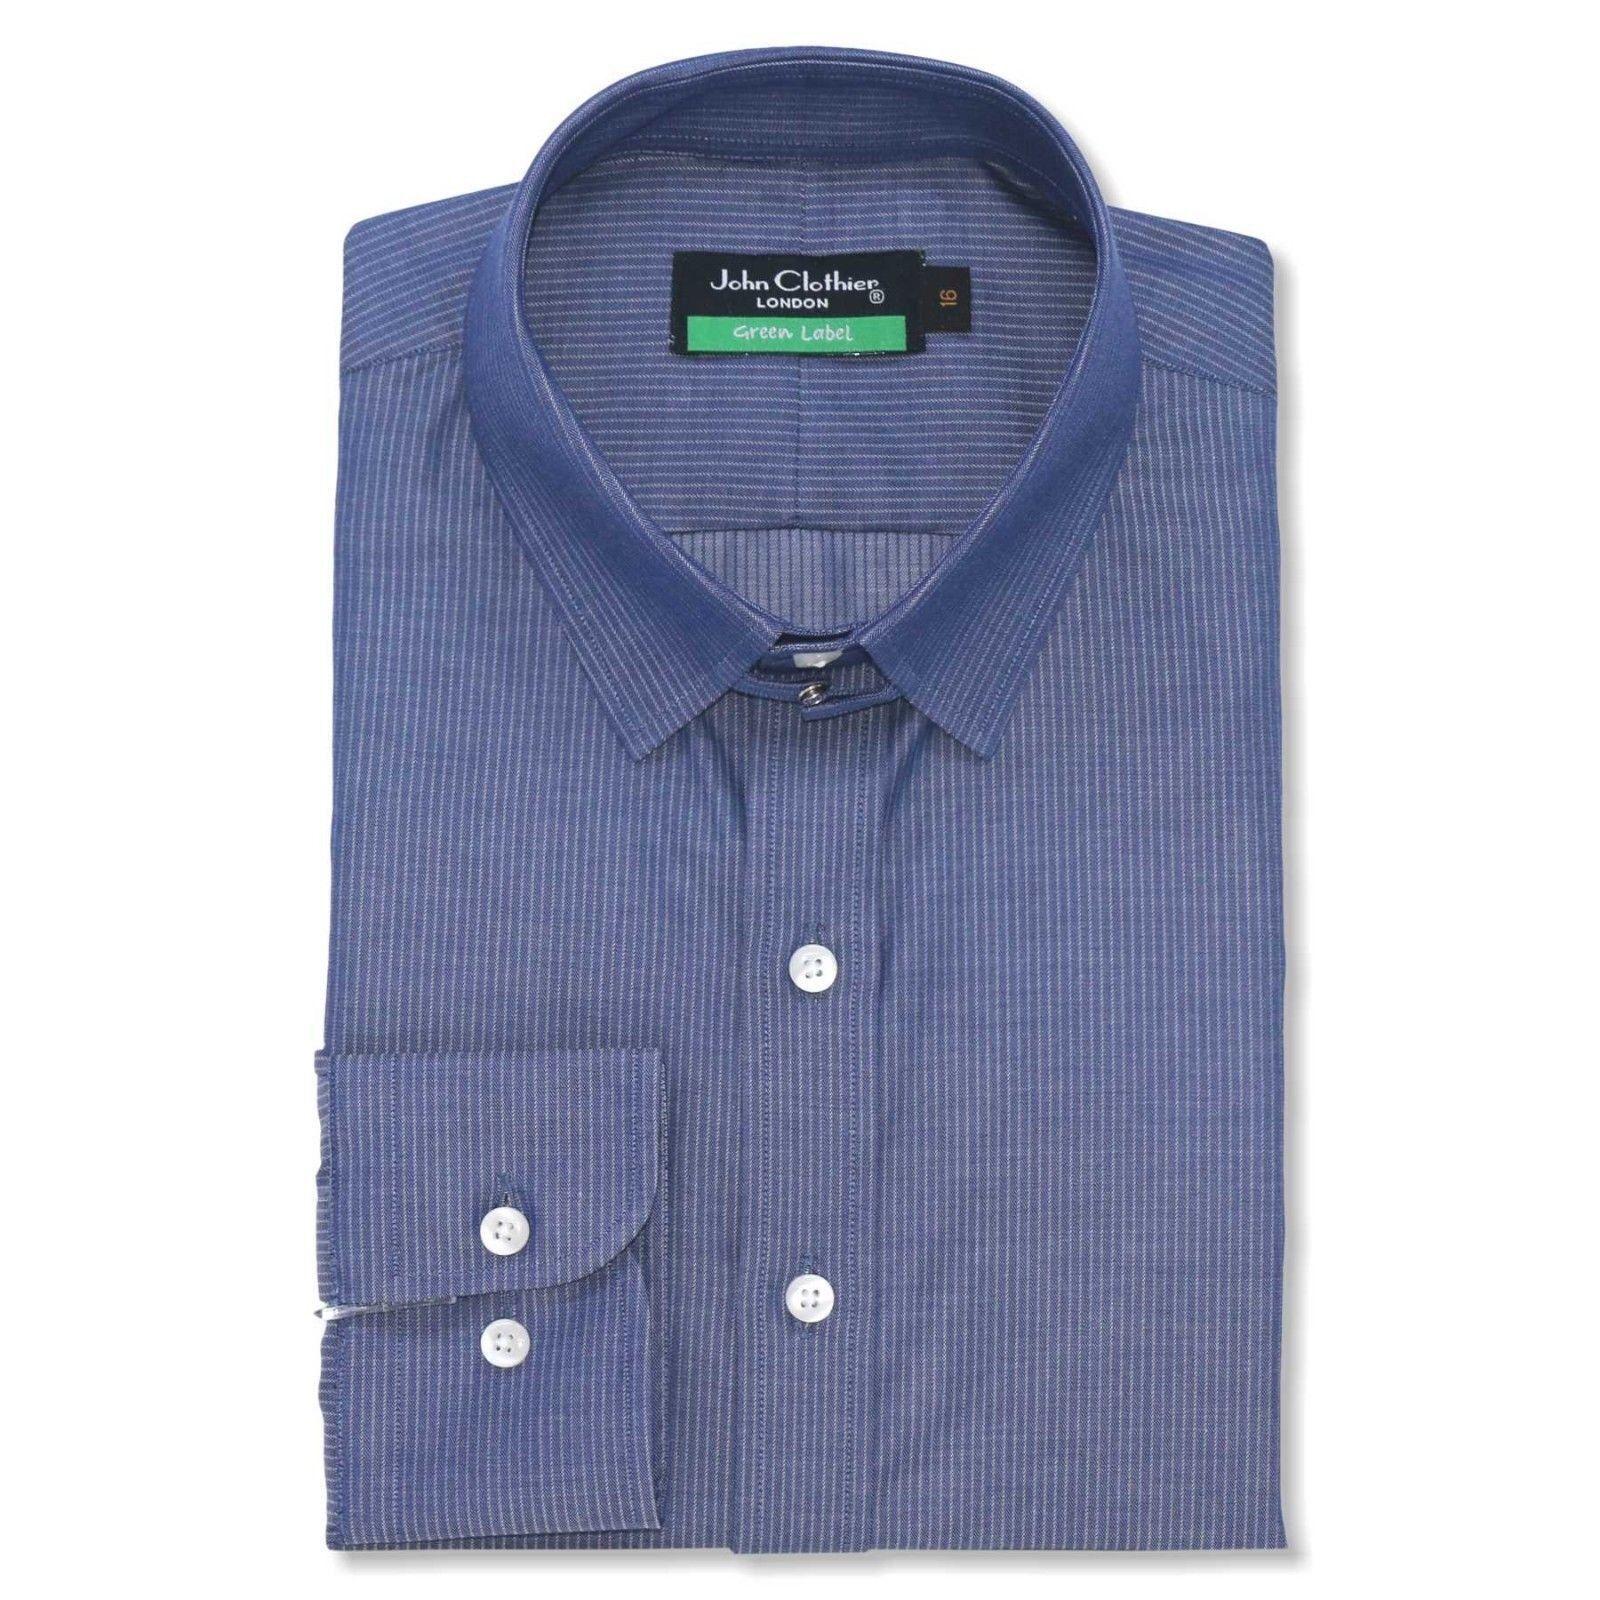 James Bond  Herren Tab collar shirt Blau Indigo pin stripes 100% cotton Loop collar